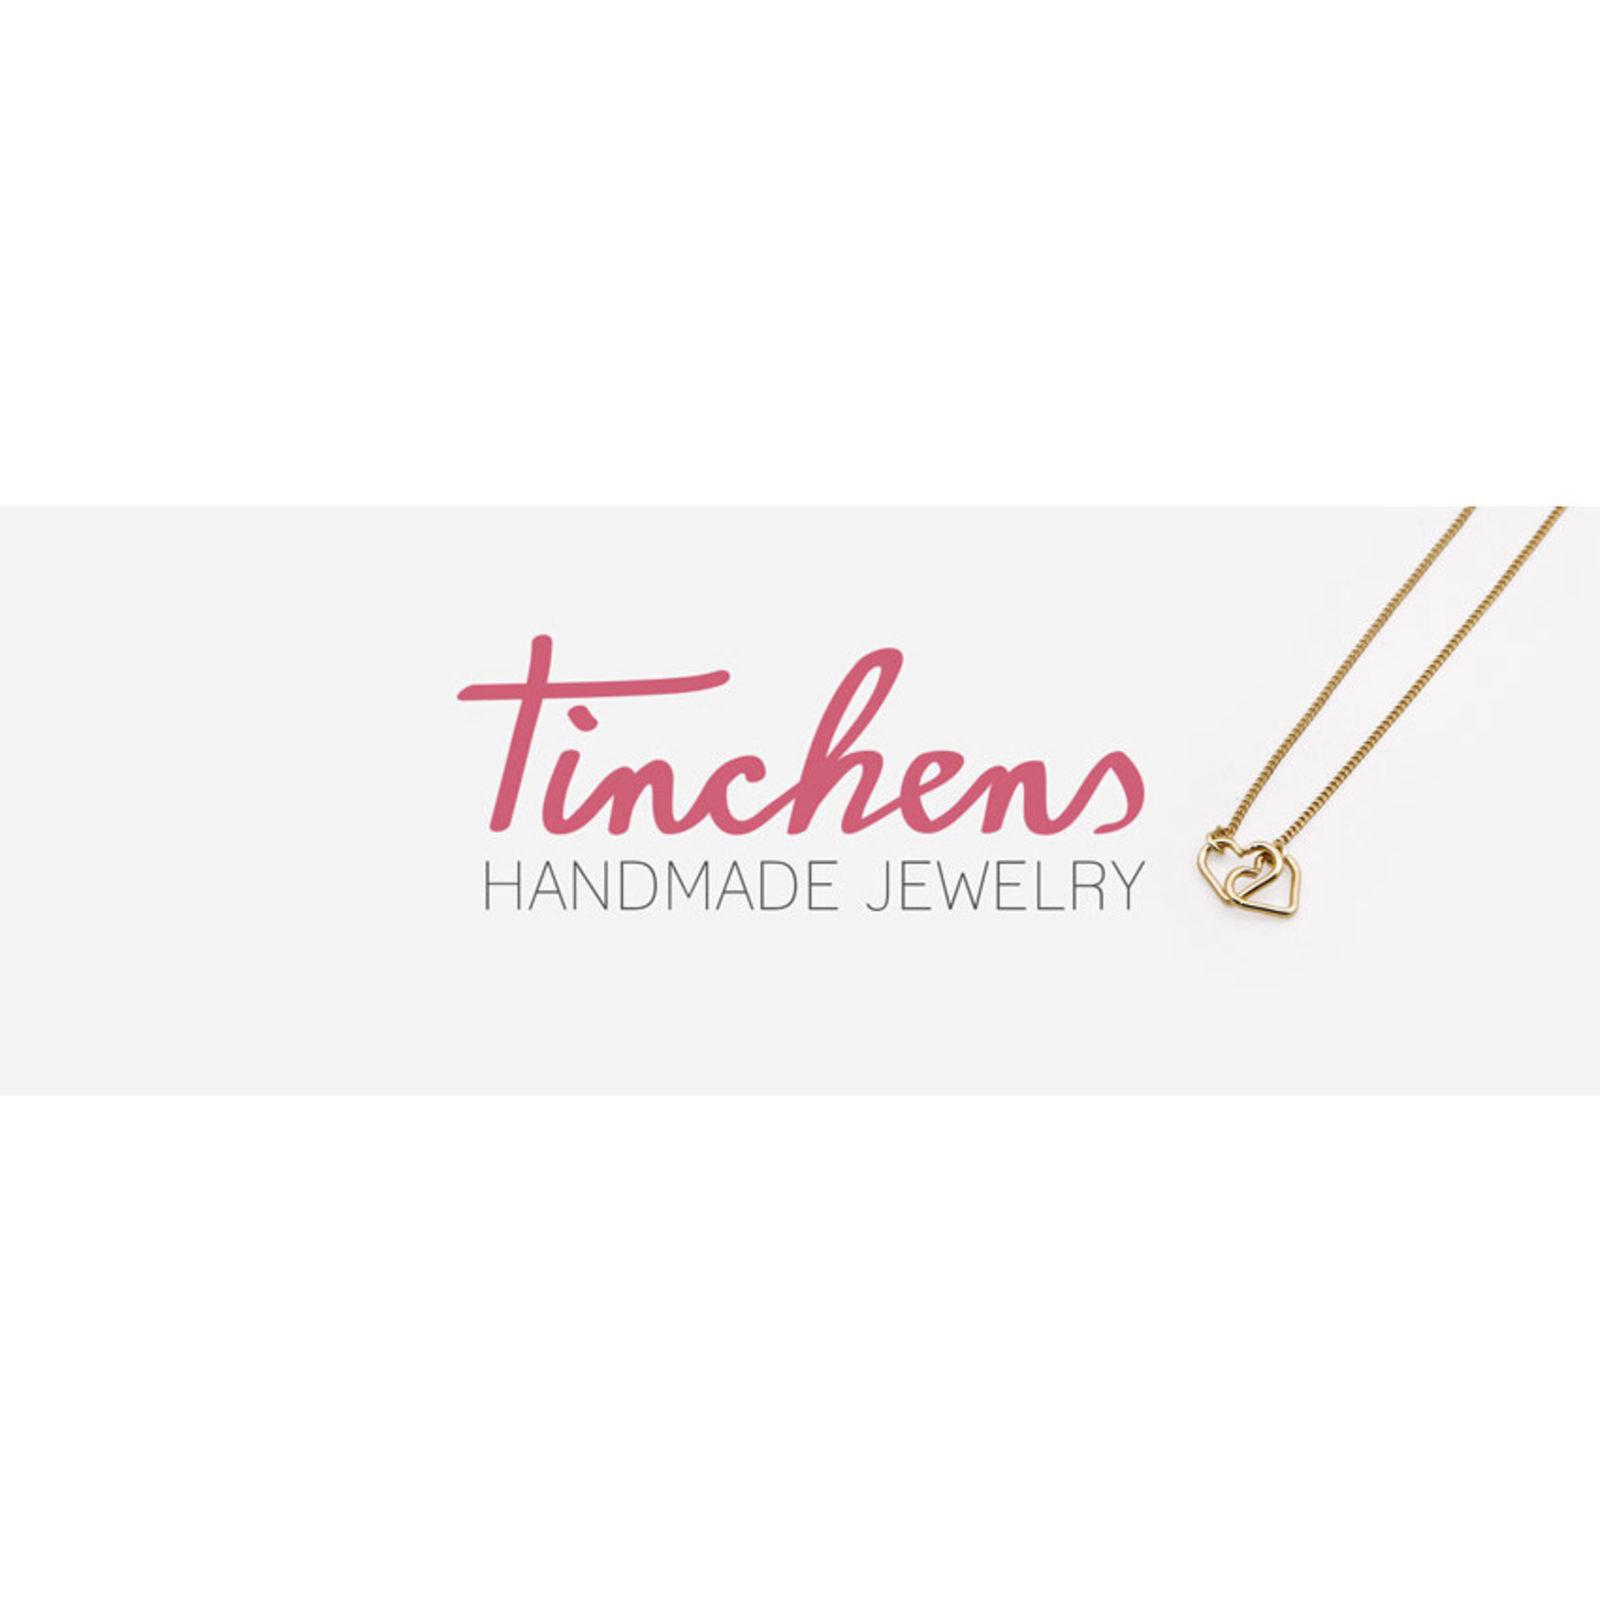 tinchens